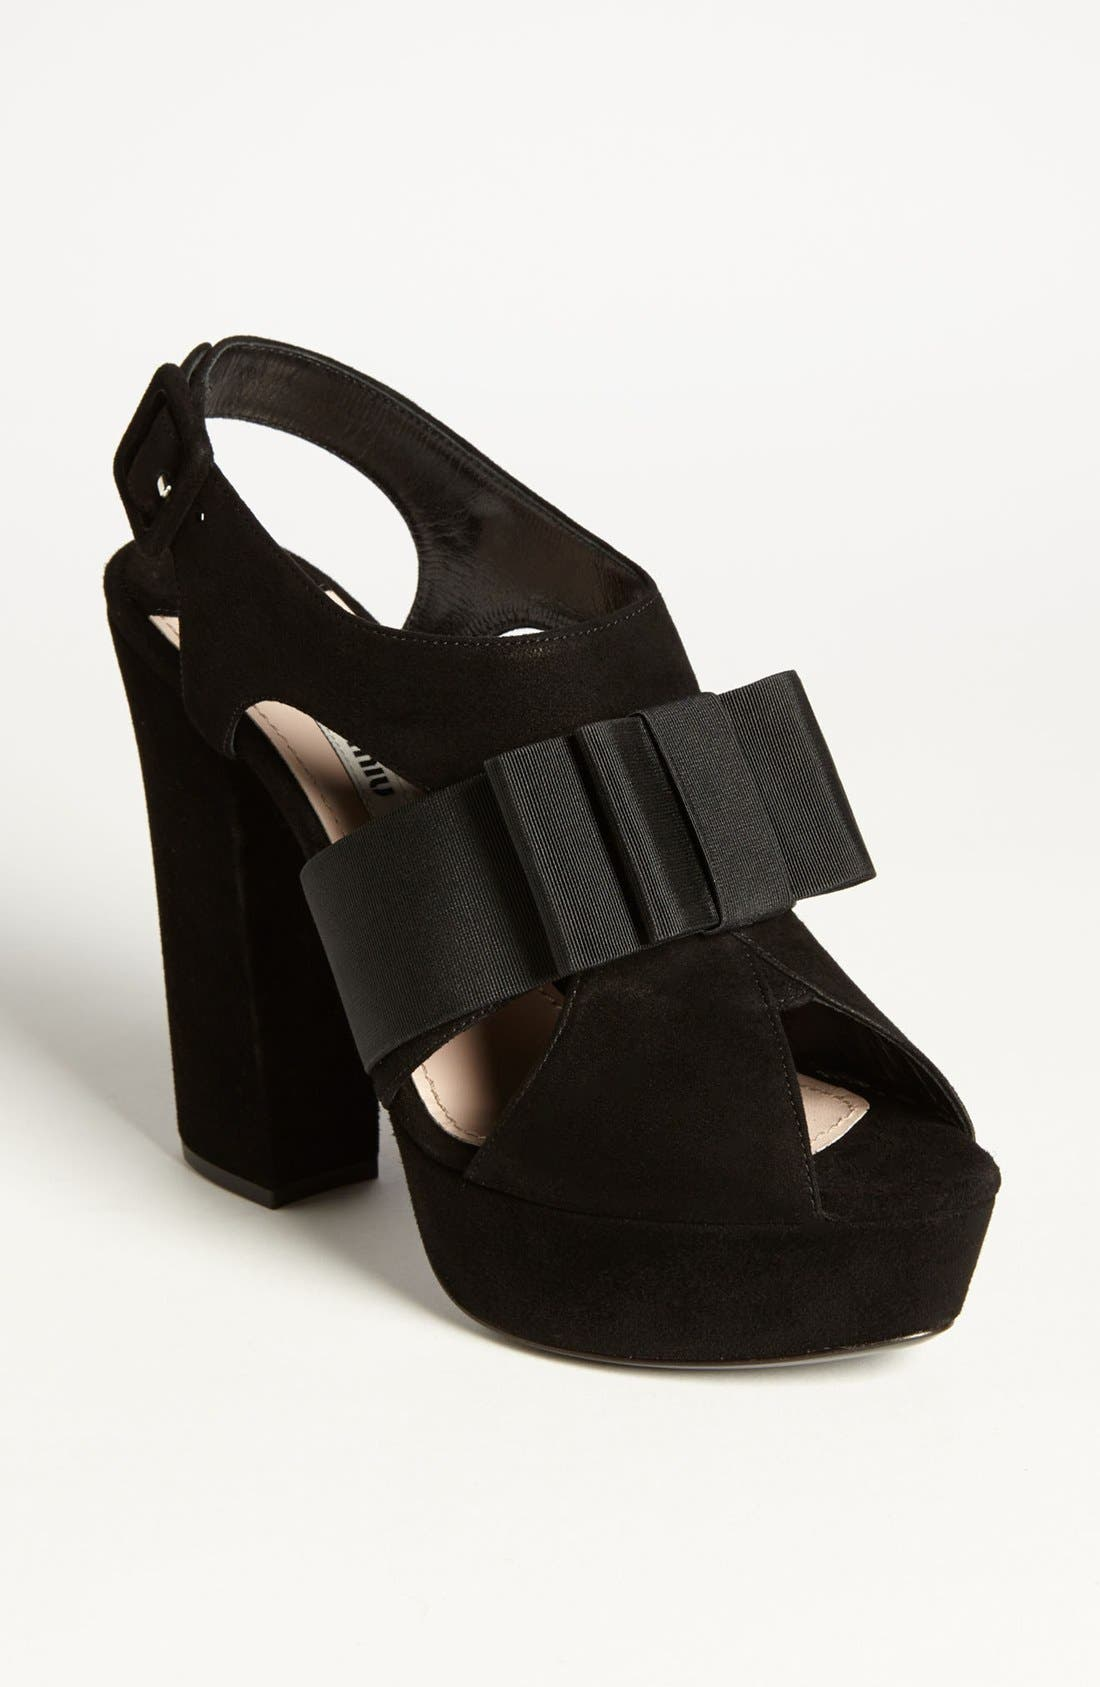 Main Image - Miu Miu 'Tuxedo Bow' Sandal